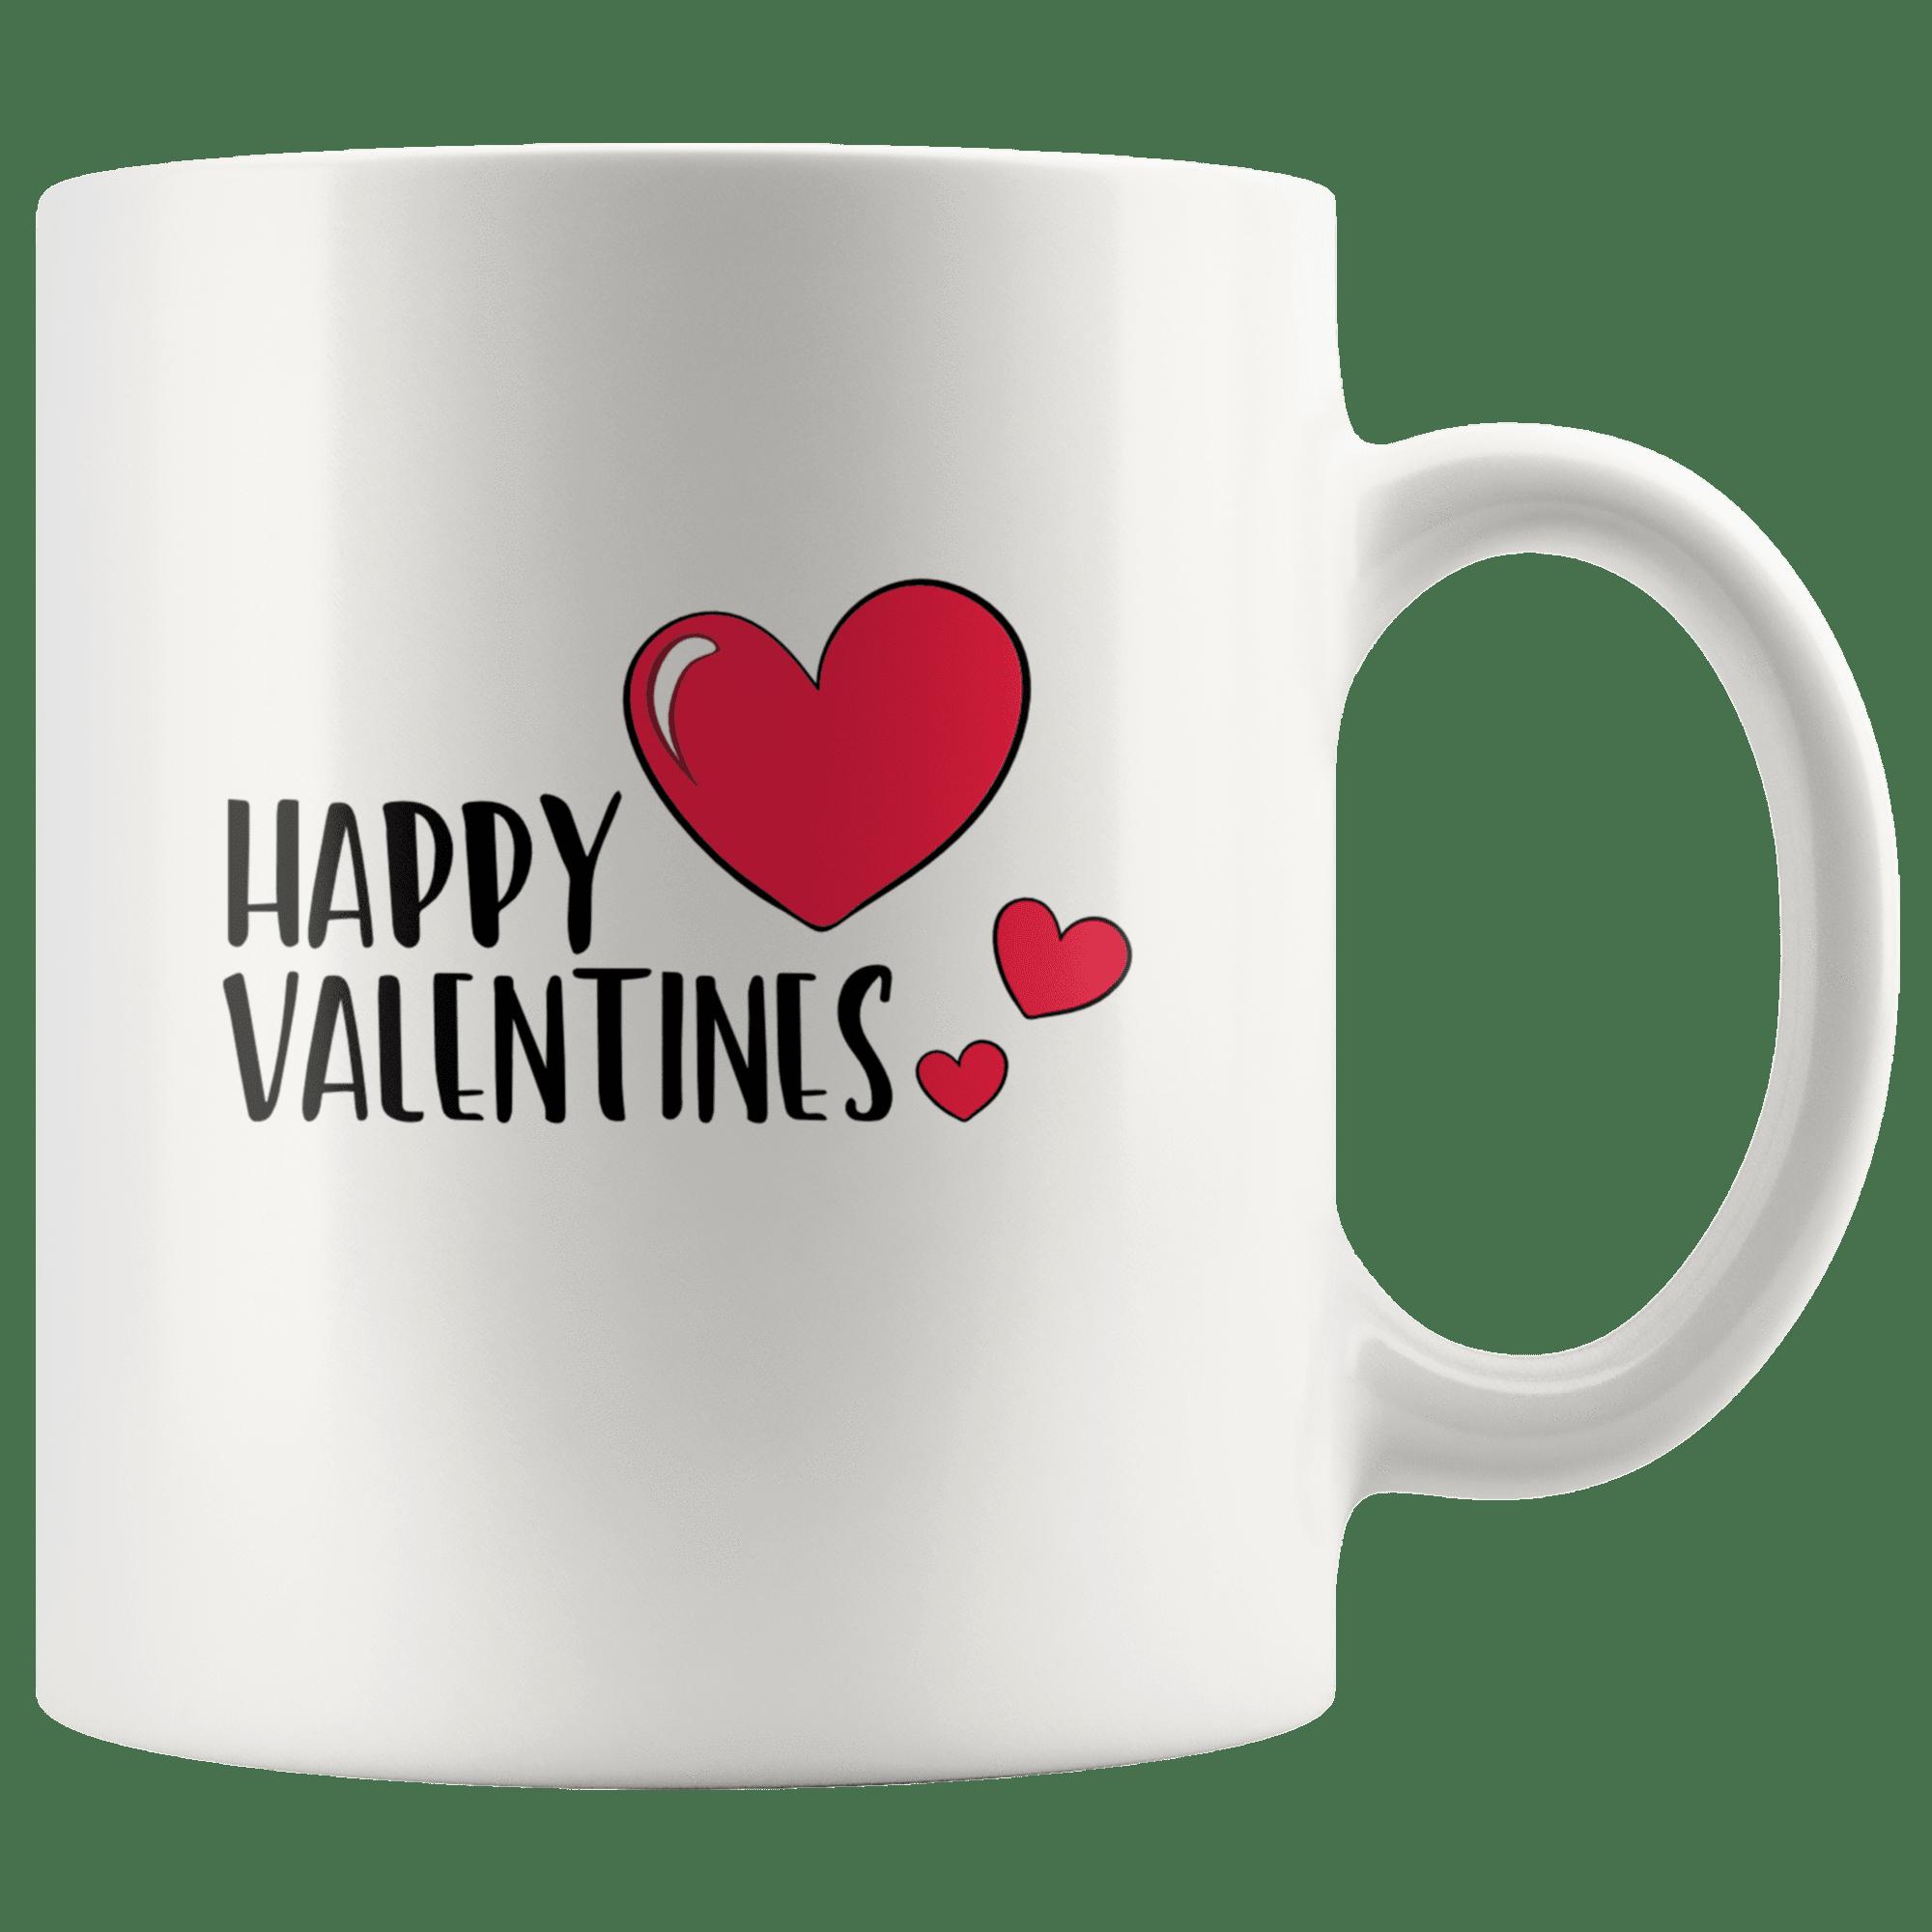 Gift Box Wife Husband Gift Valentines Hot Stuff Valentines Mug 11oz Mug